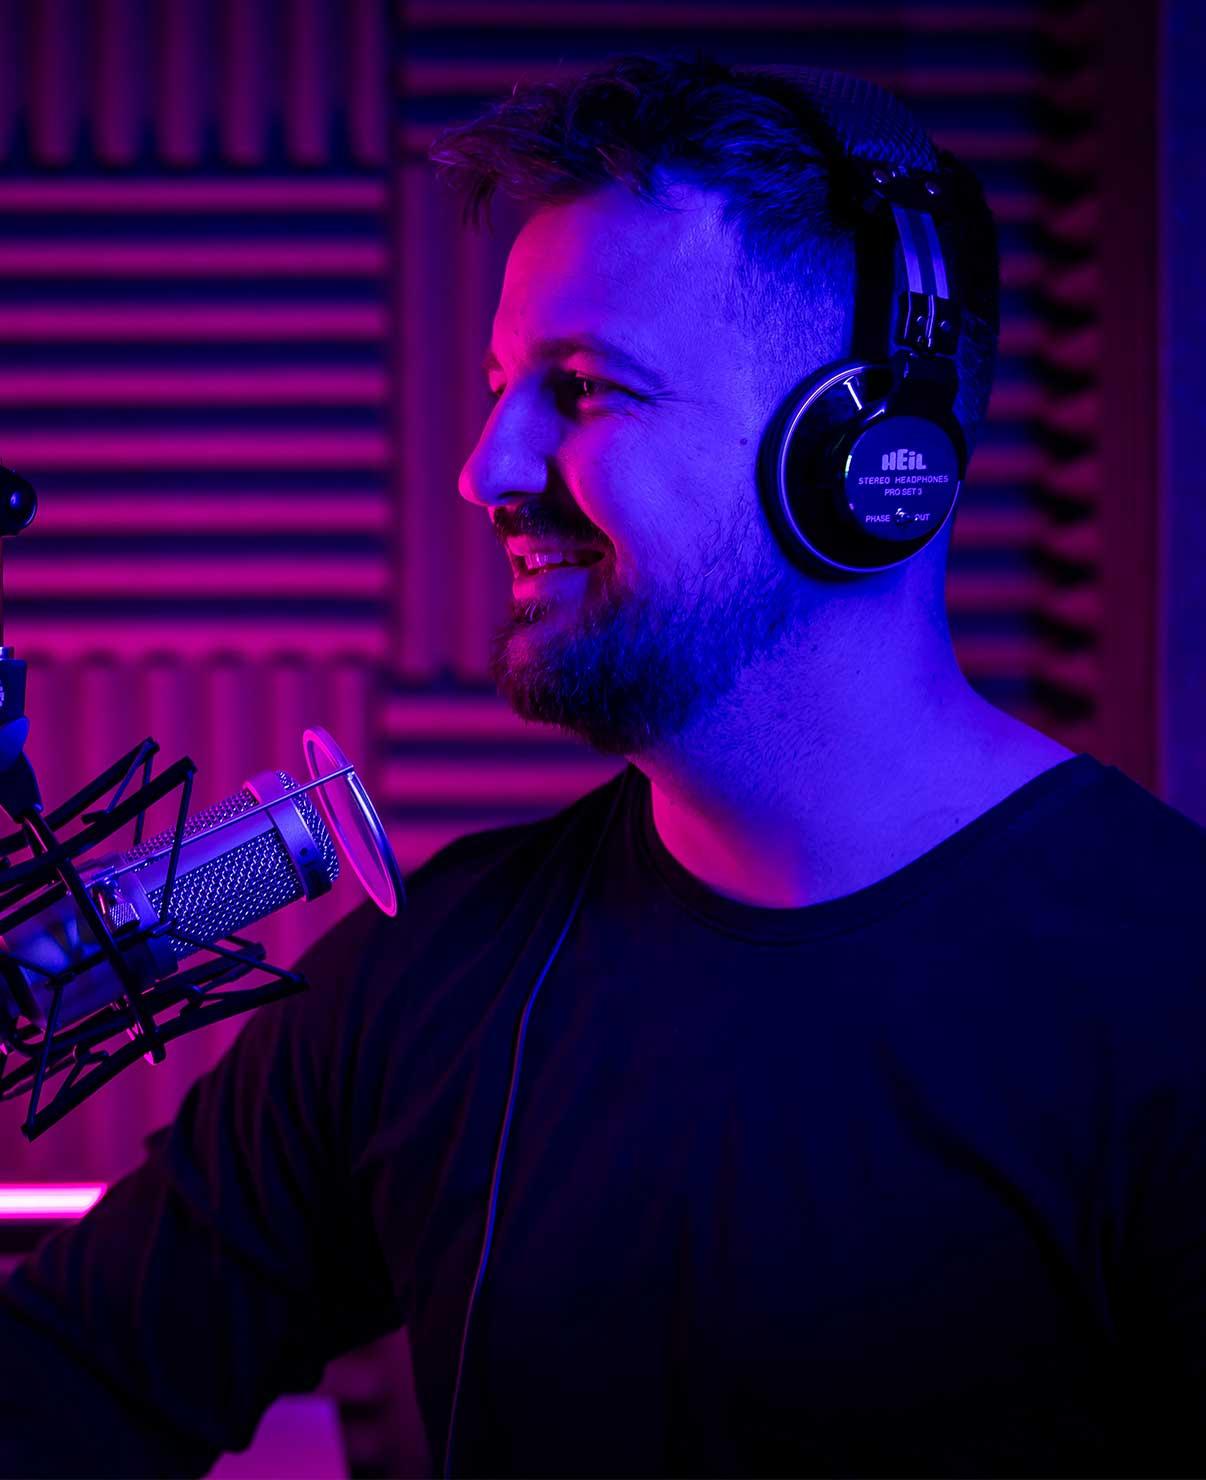 Mark Asquith recording a podcast at Rebel Base Media's podcast recording studio in Sheffield, U.K.